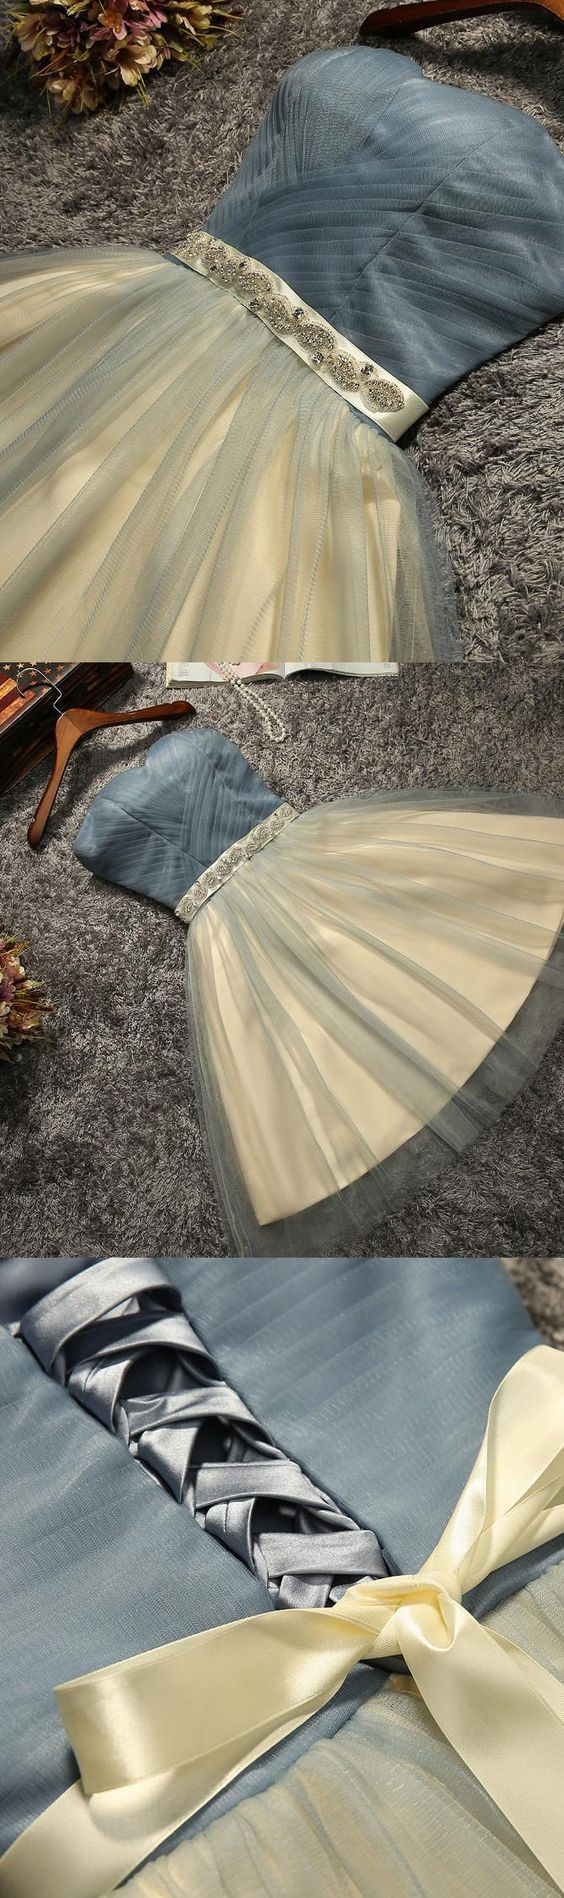 Mini Prom Homecoming Dress Short Light Blue Dresses With Lace Up Bowknot Strapless Fancy Prom Dresse M1639 #homecomingdressesshort